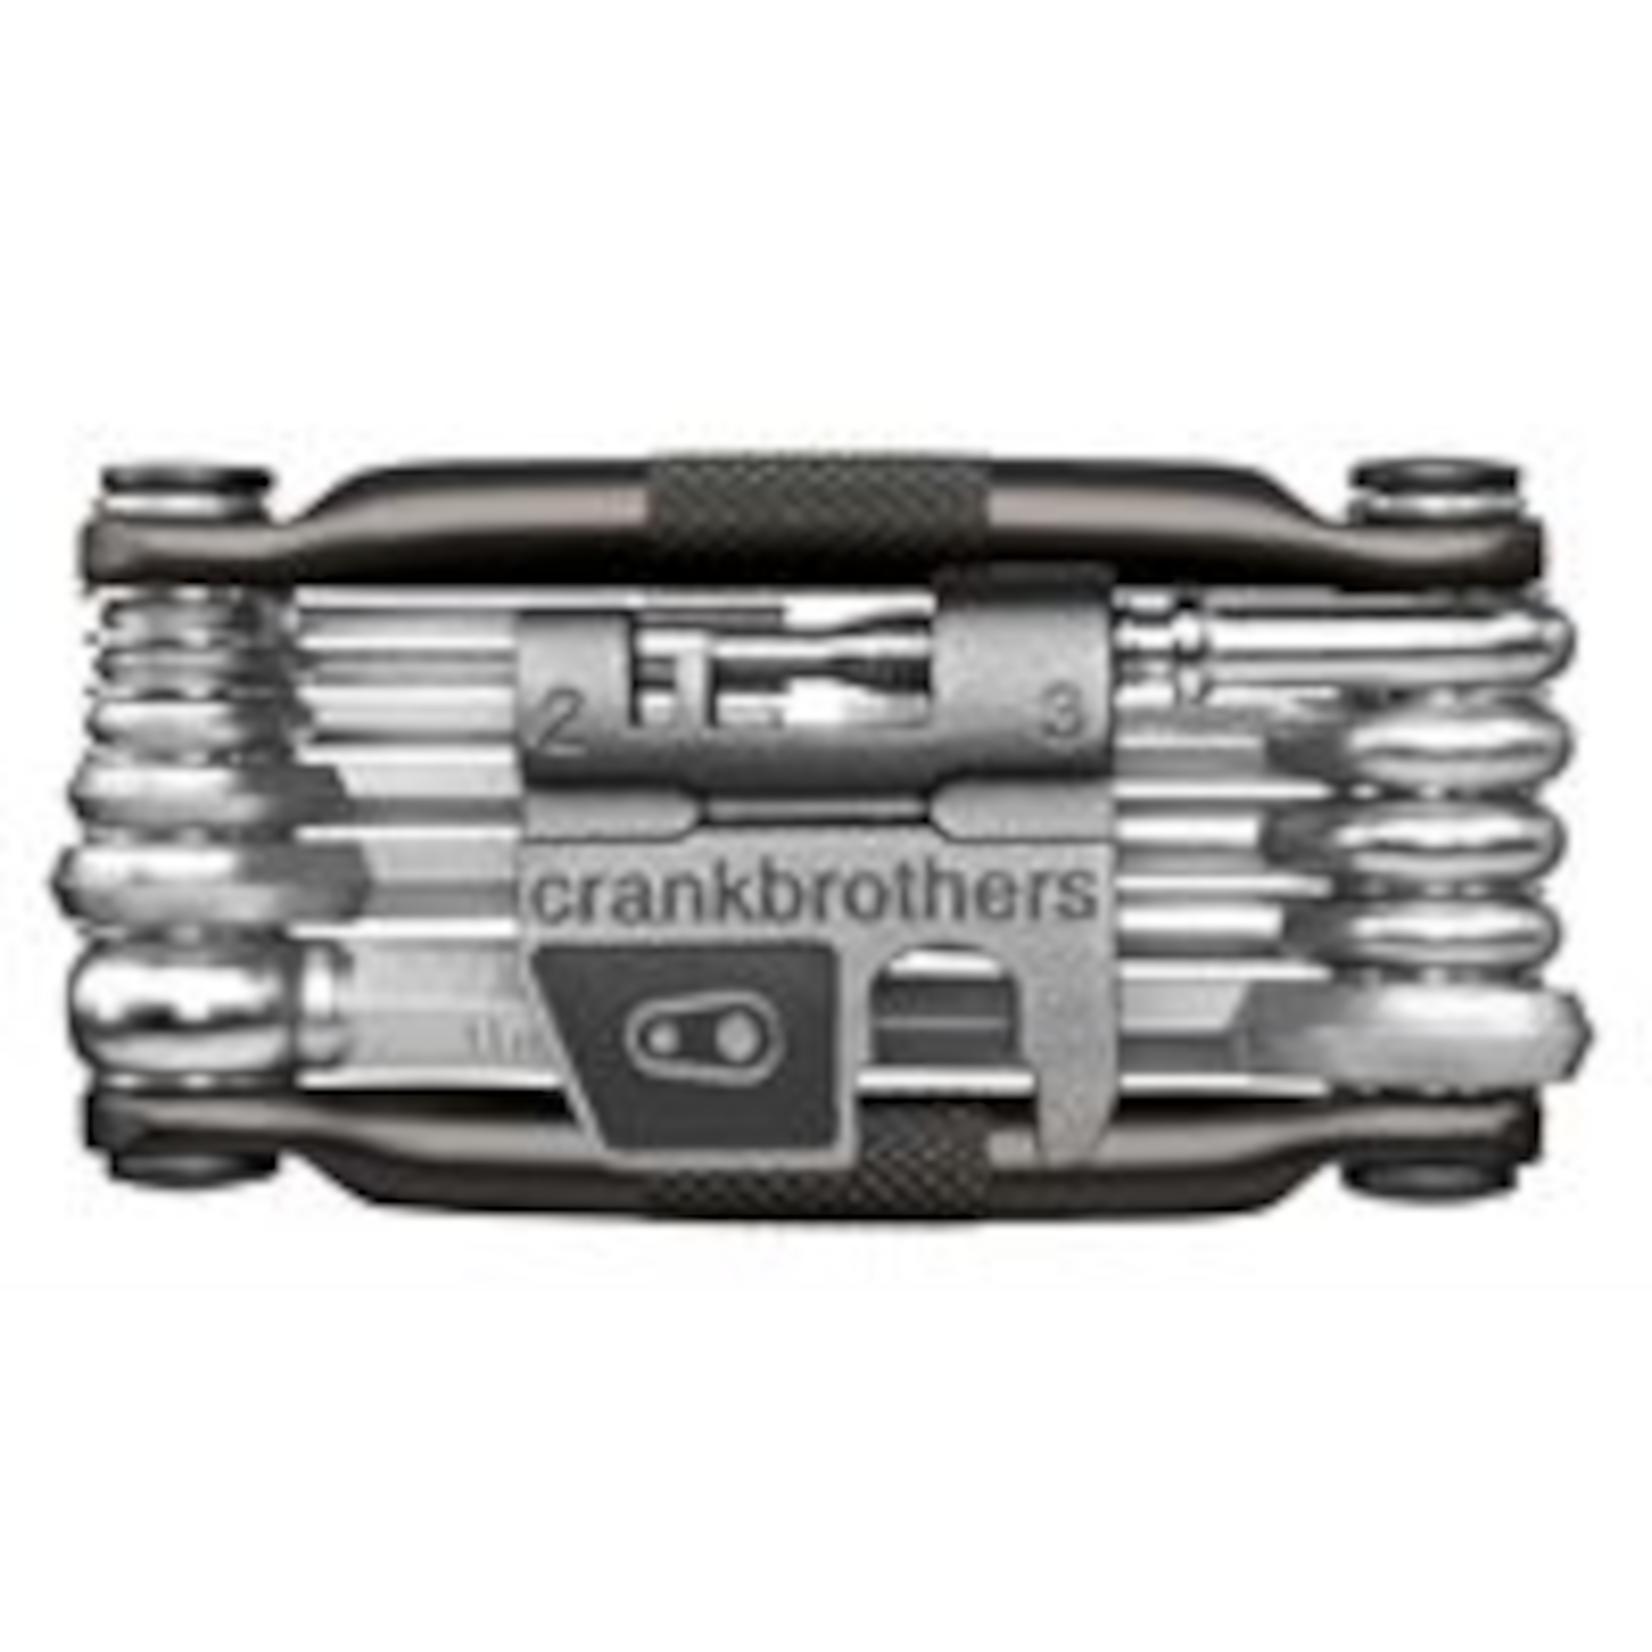 CRANK BROTHERS Crankbrothers M17 Multi-tool